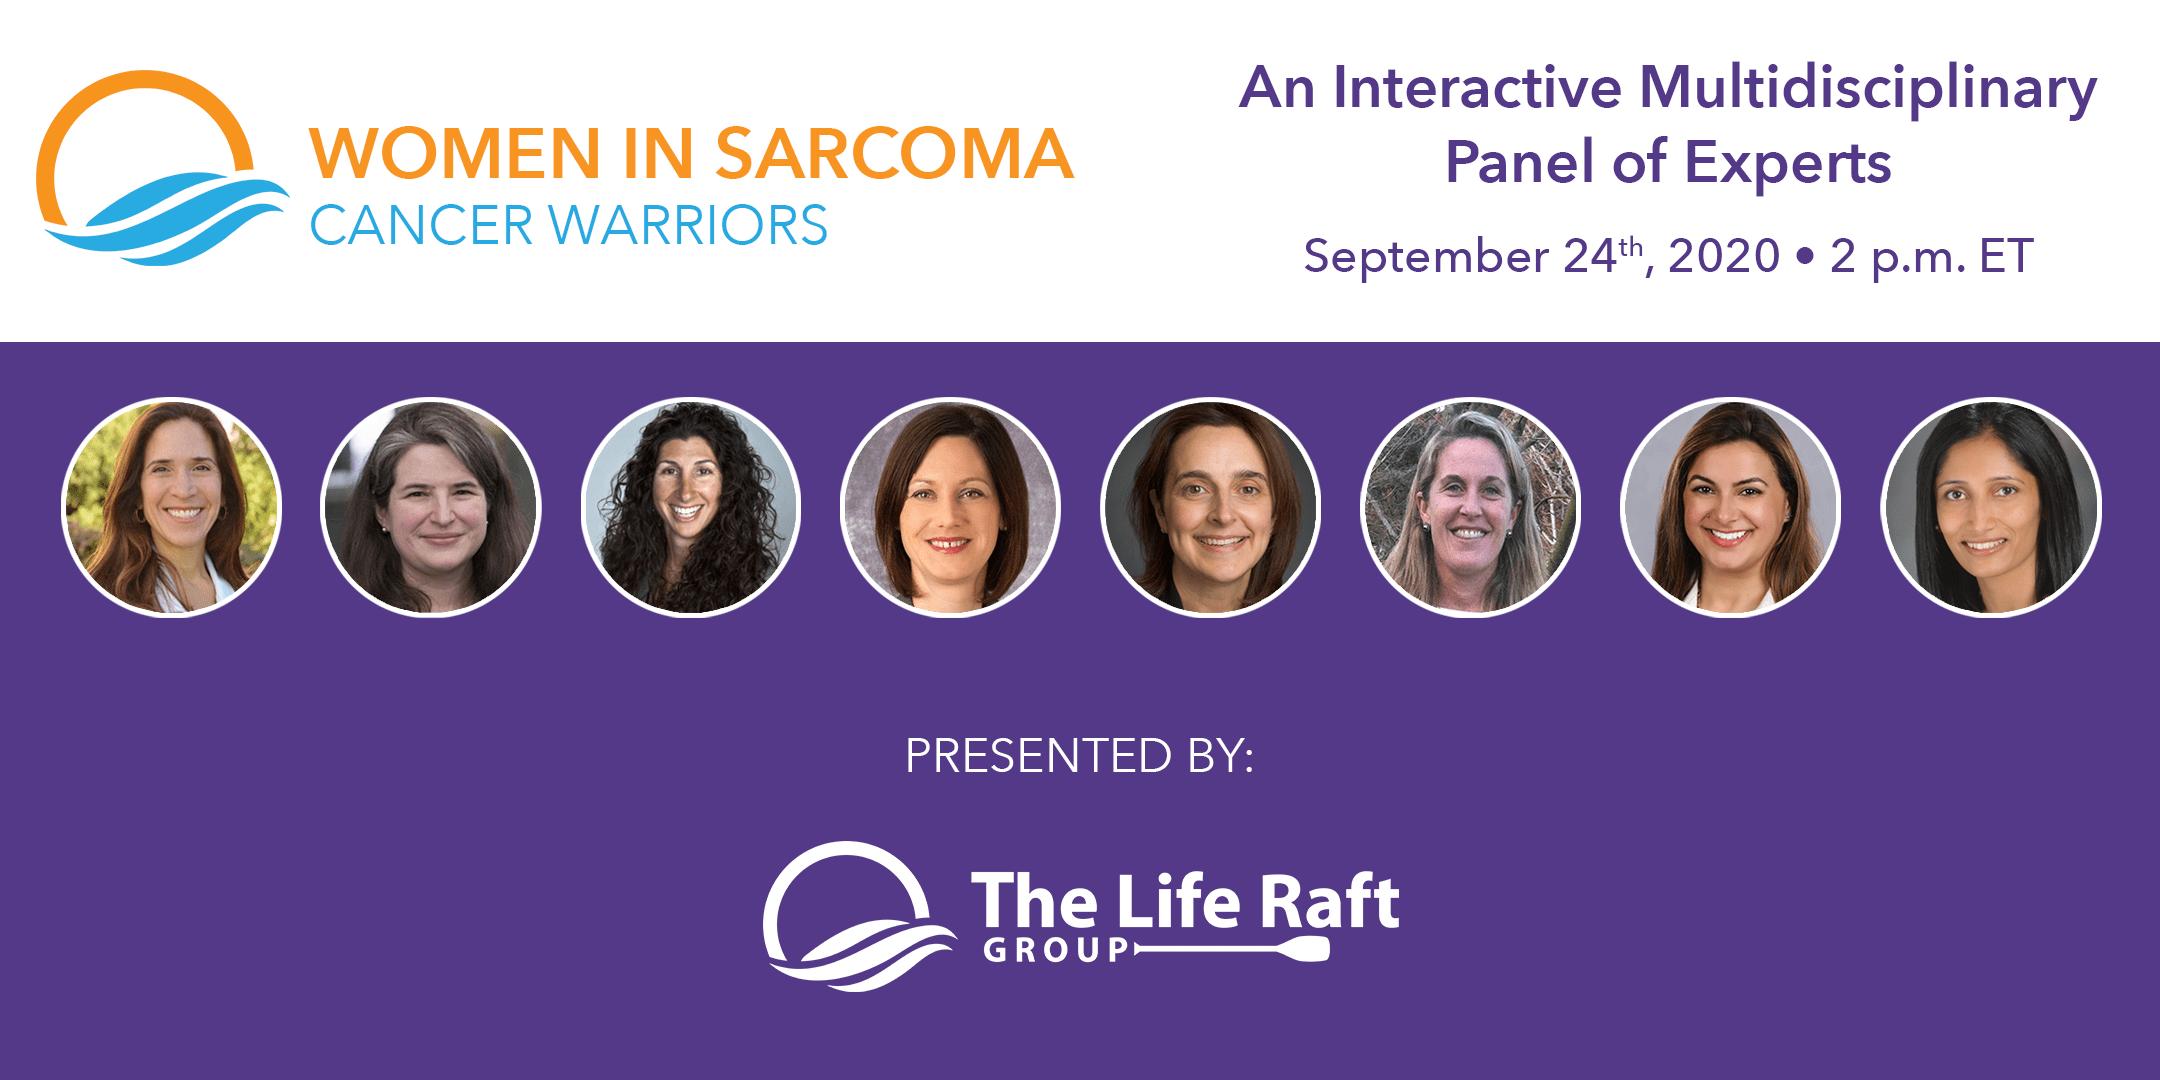 Women in Sarcoma